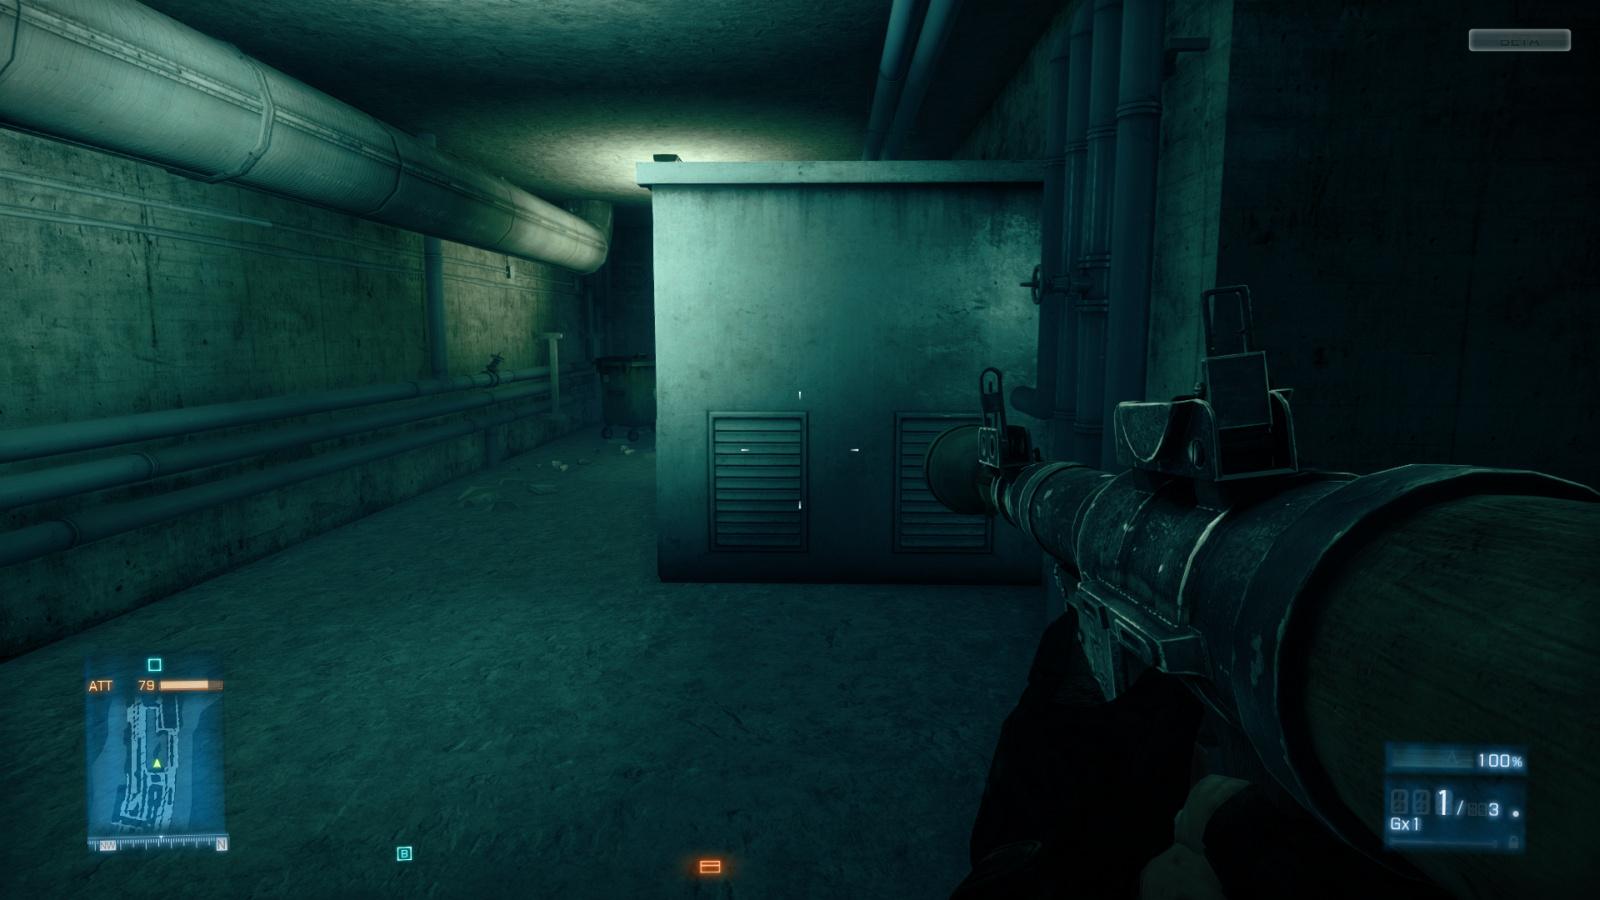 Beta Battlefieldu 3 je live – hratelnost, grafika, galerie 52435